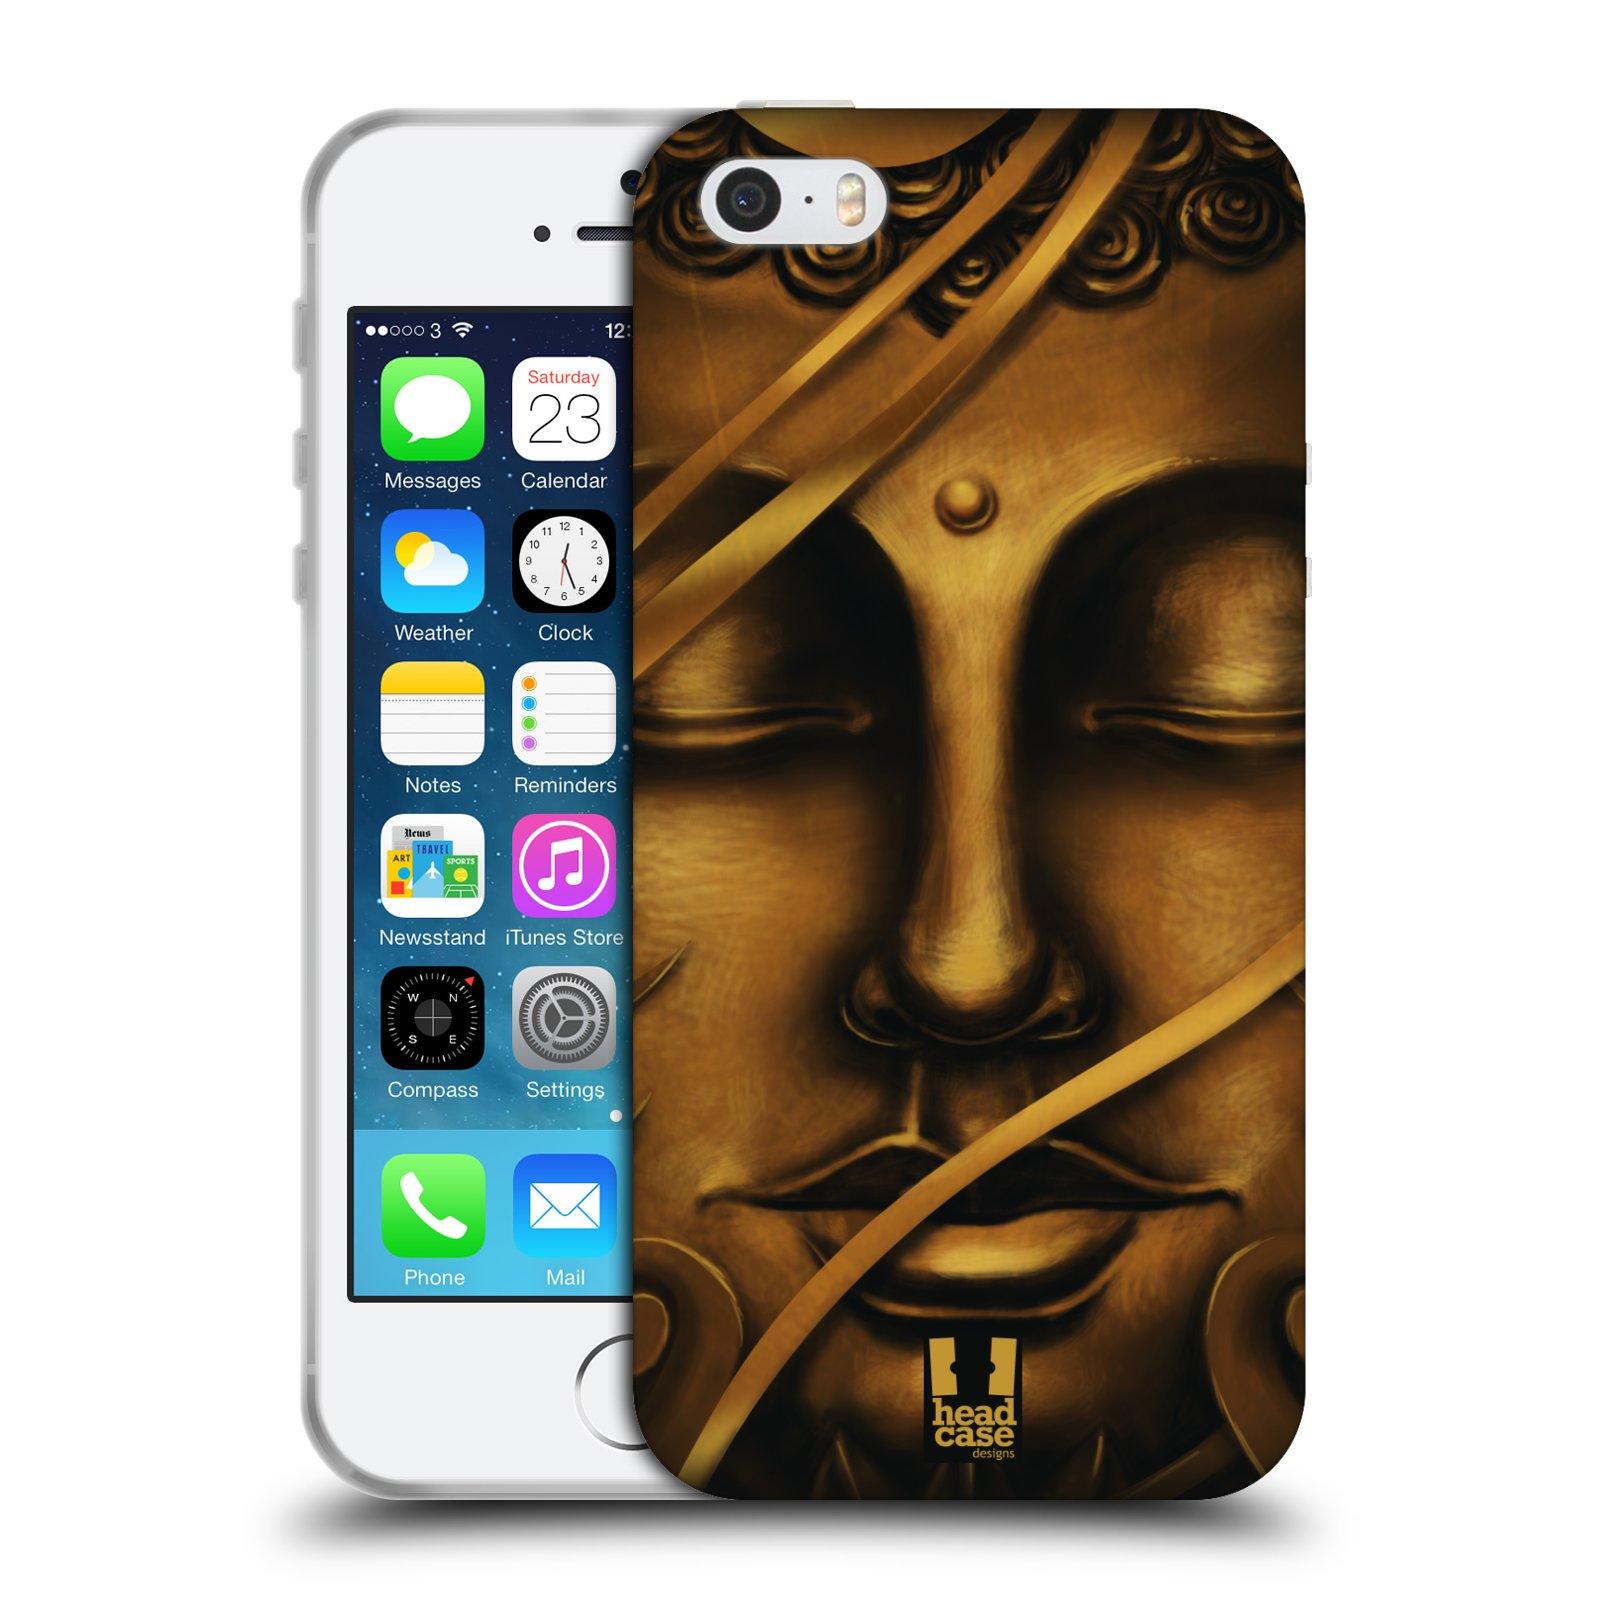 HEAD CASE silikonový obal na mobil Apple Iphone 5/5S vzor BUDDHA ZLATÝ BUDHA